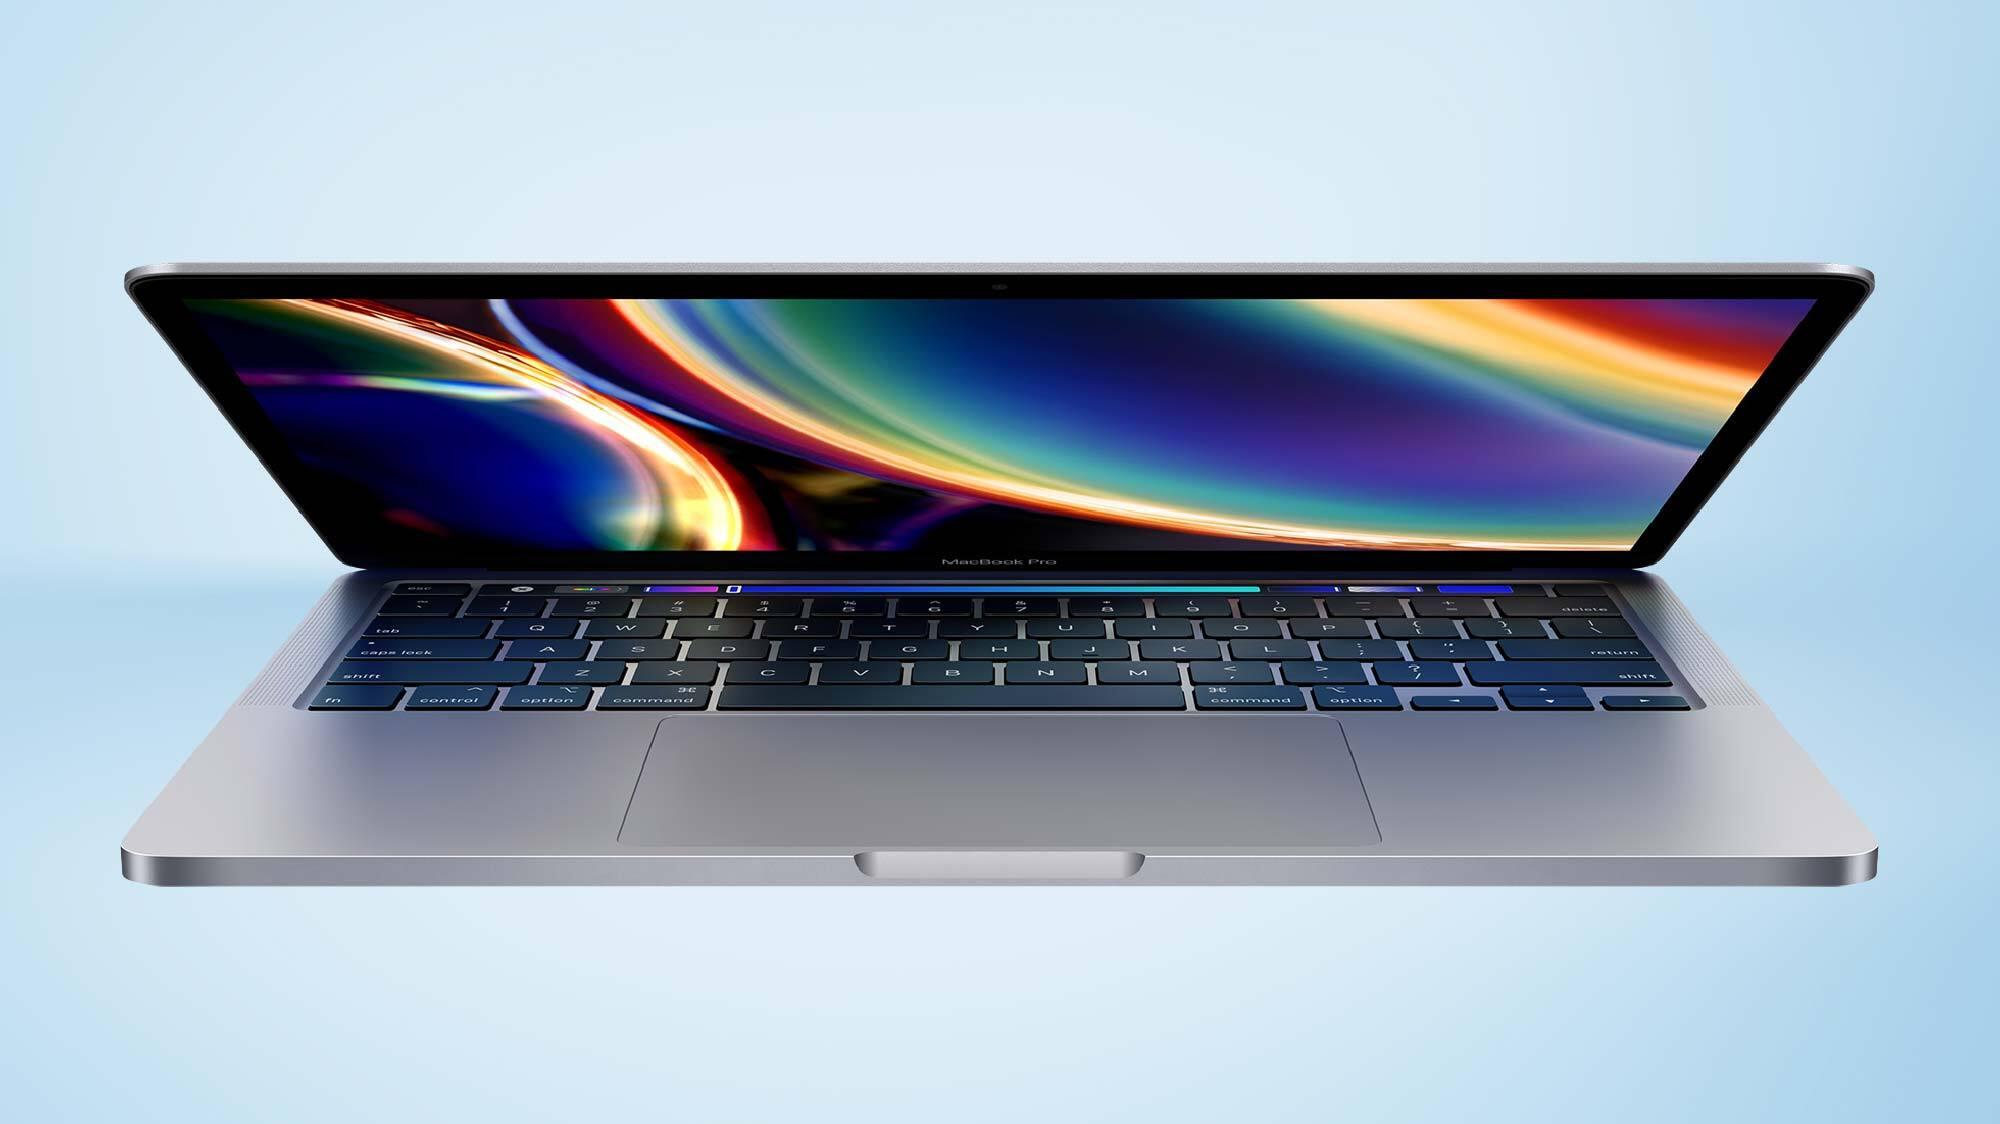 The MacBook Pro 2020